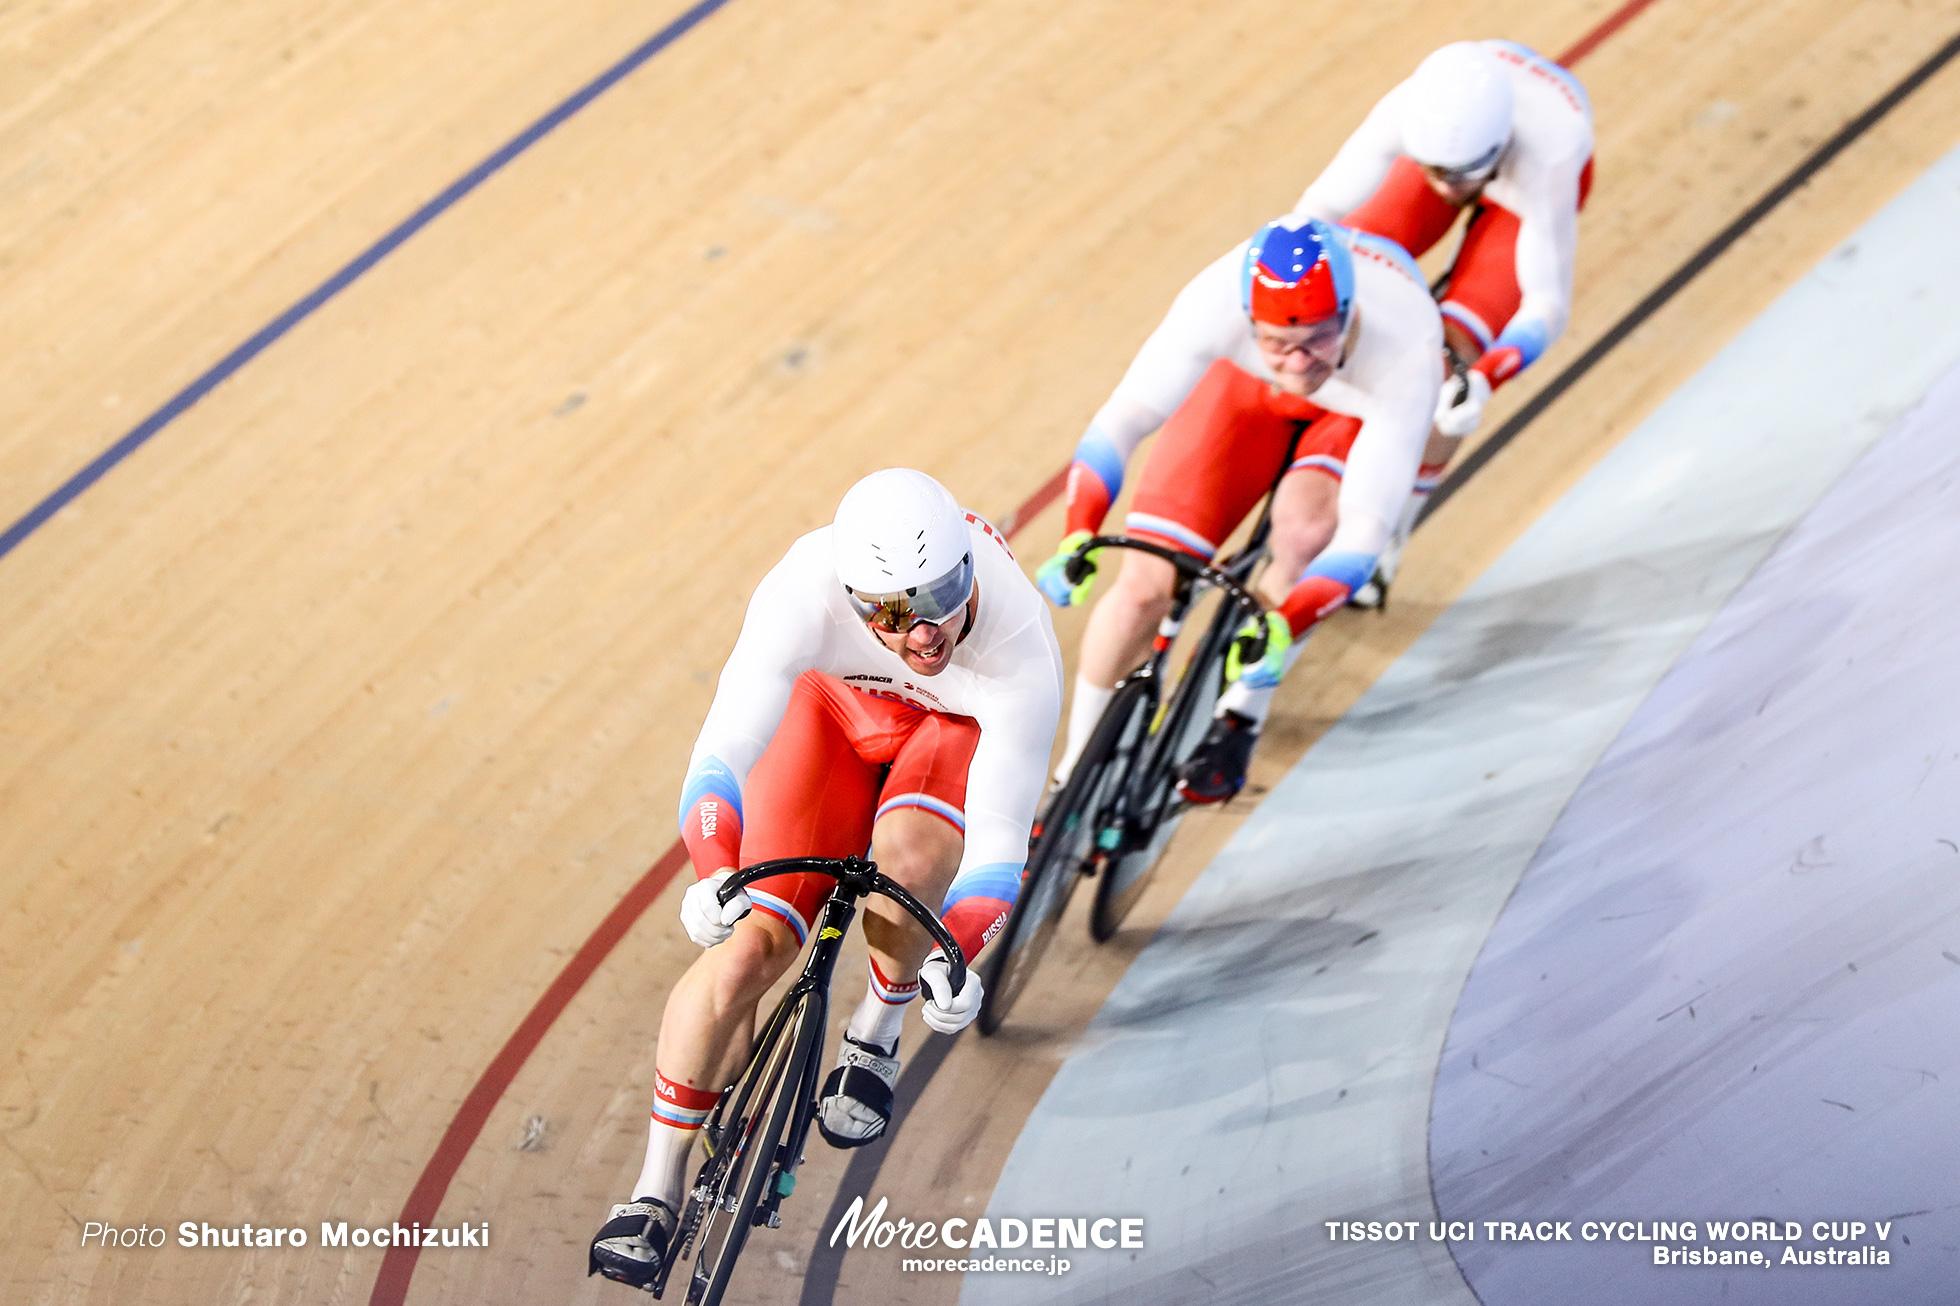 1st Round / Men's Team Sprint / TISSOT UCI TRACK CYCLING WORLD CUP V, Brisbane, Australia, Shane Alan PERKINS シェーン・パーキンス Nikita SHURSHIN ニキータ・シュルシン Pavel YAKUSHEVSKIY パベル・ヤクシェフスキ